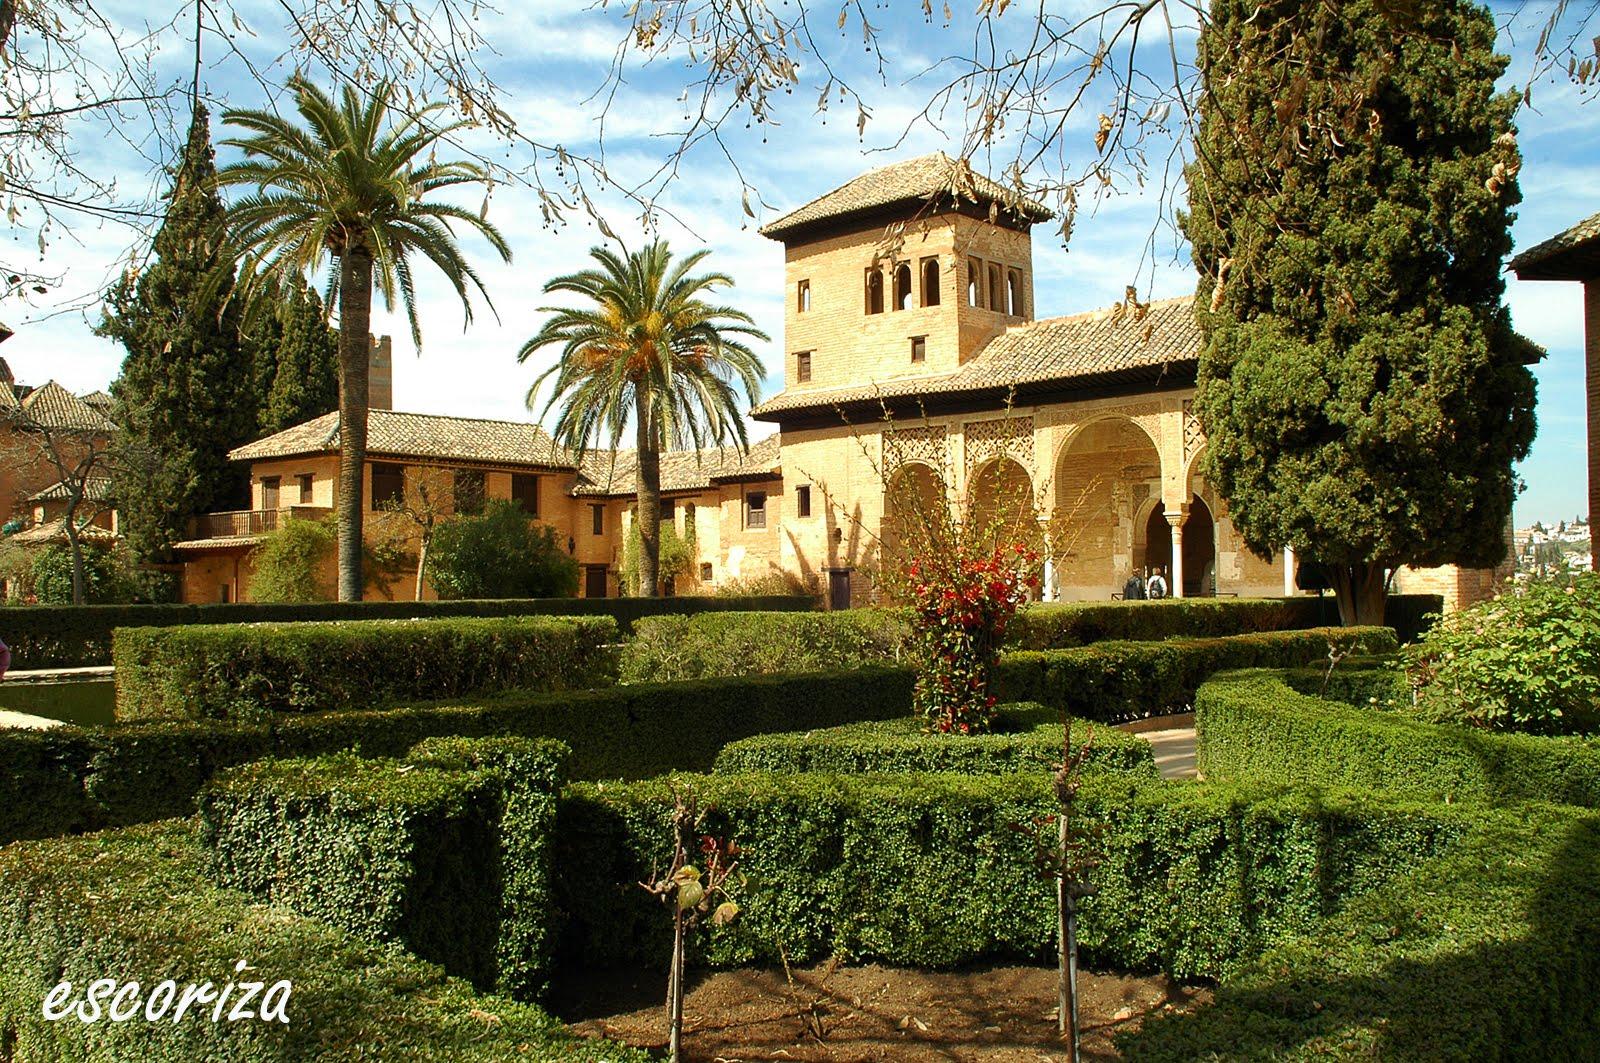 Escoriza jardines de la alhambra granada for Jardines de gomerez granada